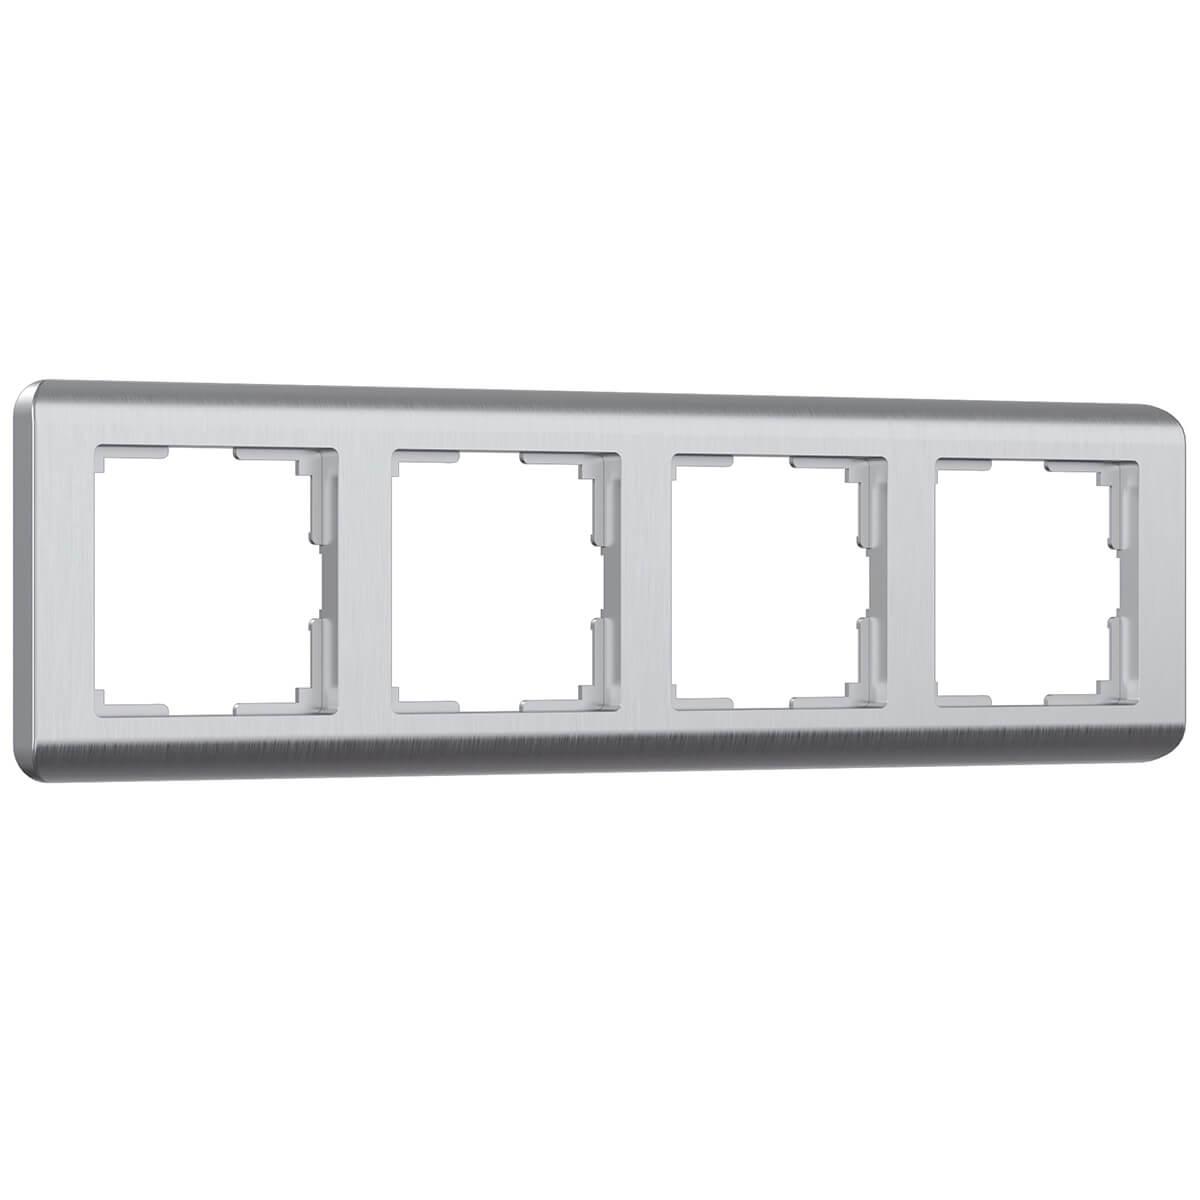 цена Рамка Stream на 4 поста серебряный WL12-Frame-04 4690389076398 онлайн в 2017 году